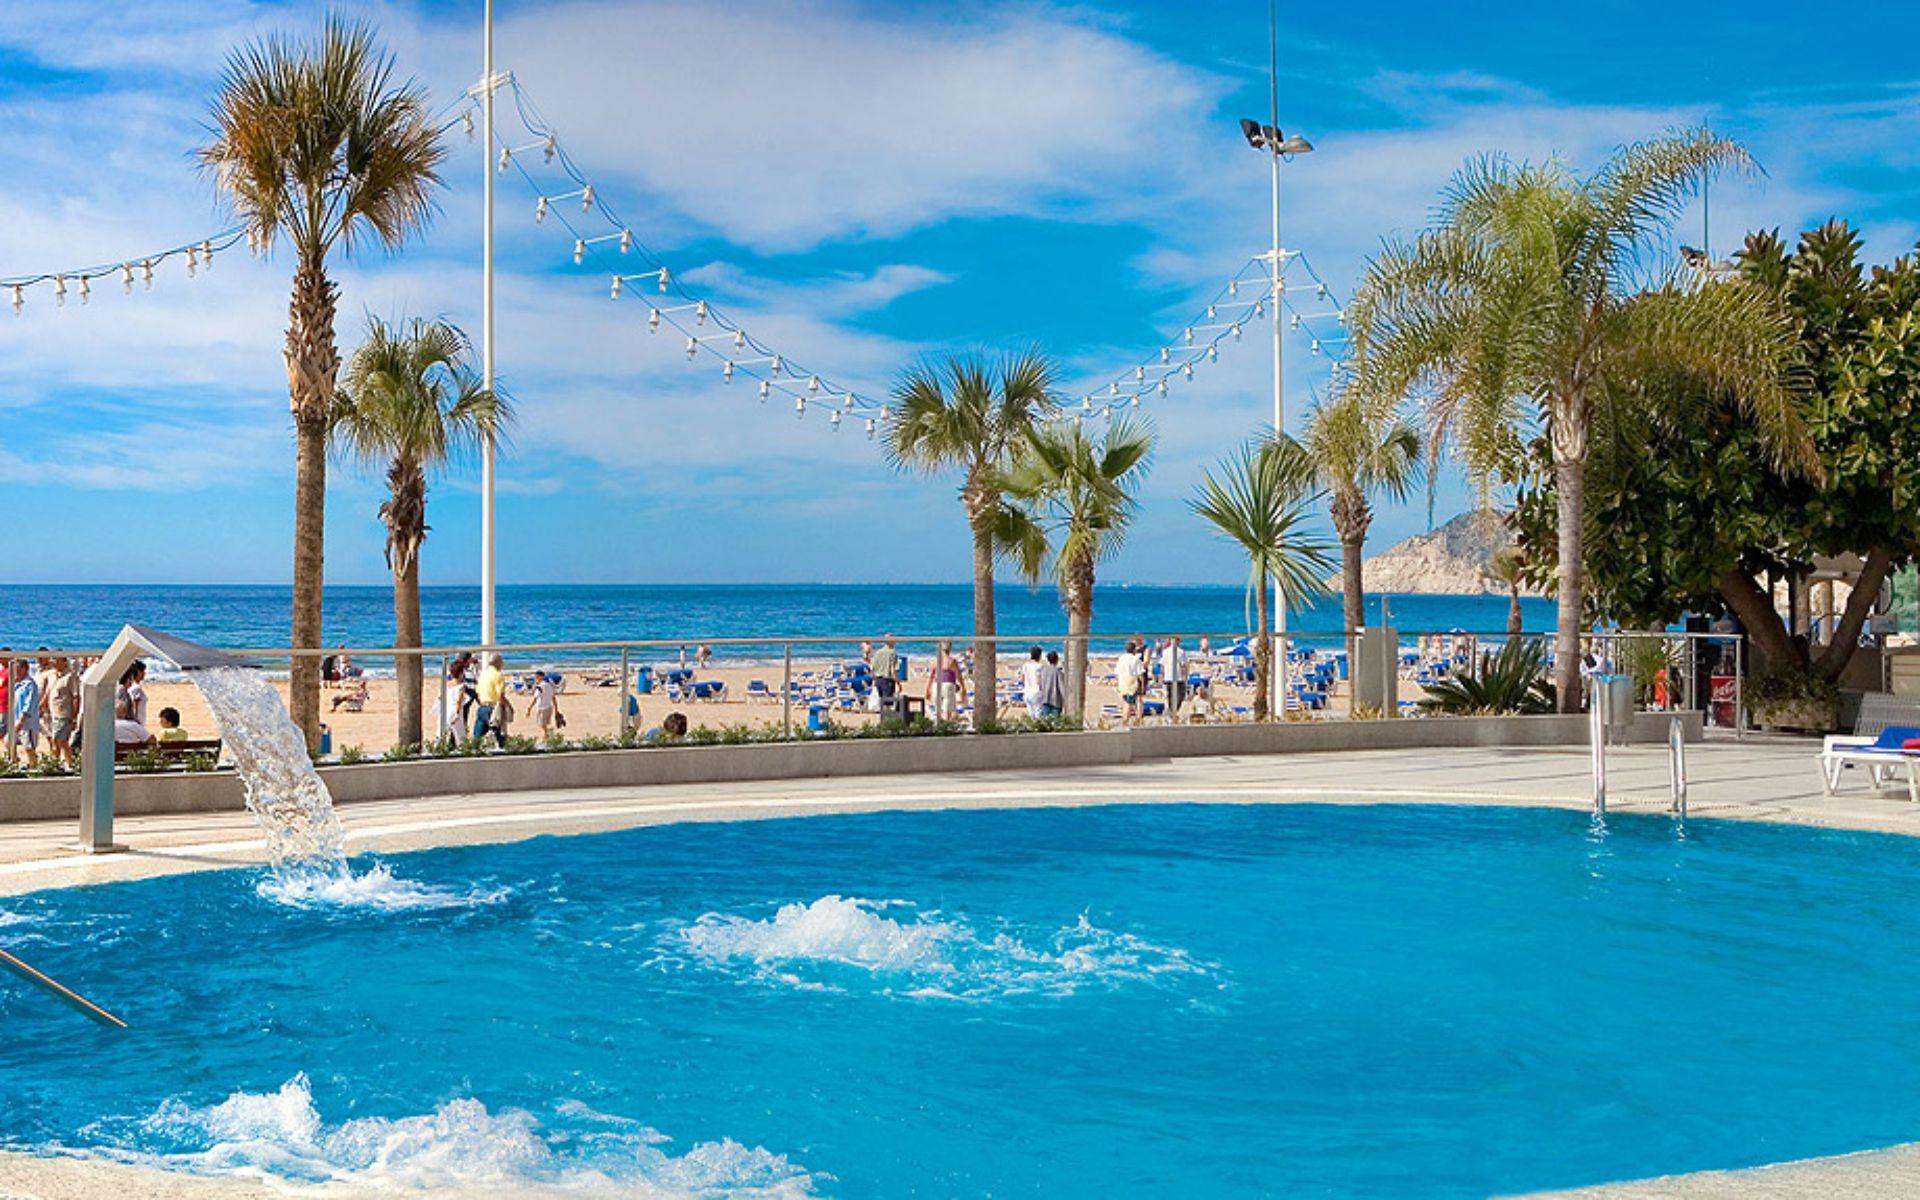 Hotel cimbel en benidorm costa blanca desde 37 for Piscinas benidorm